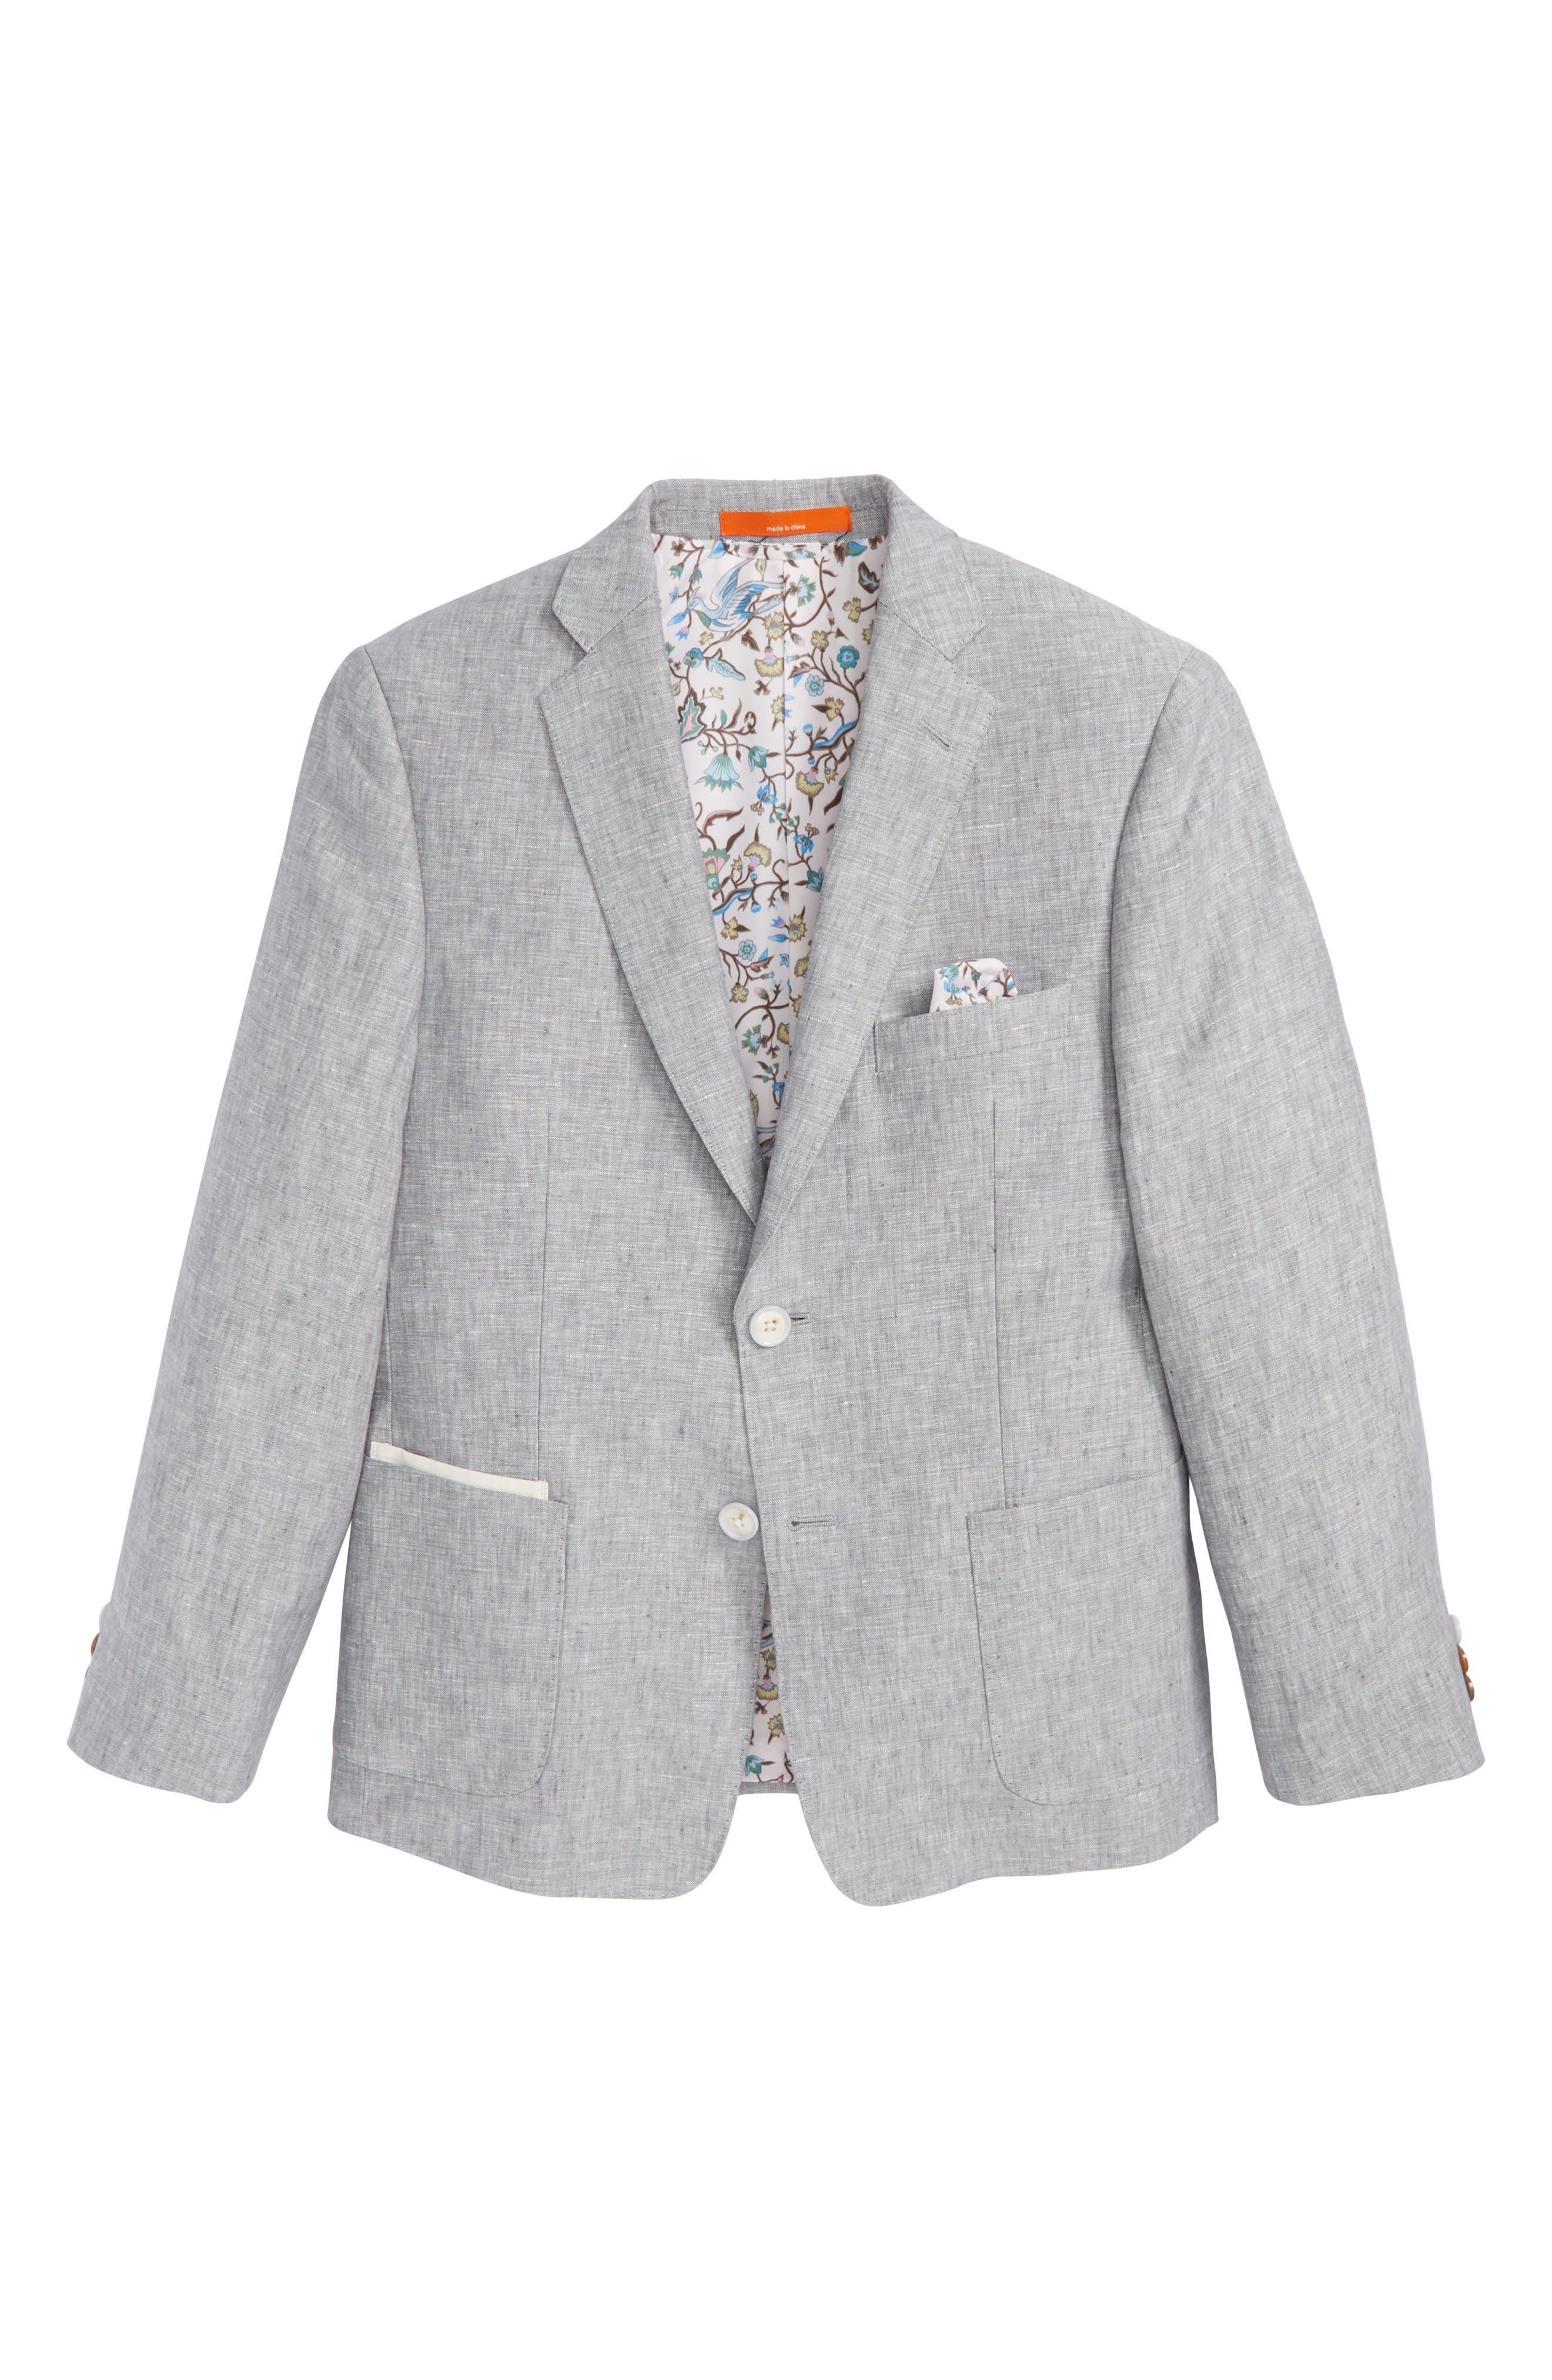 Alternate Image 1 Selected - Tallia Linen Blazer (Big Boys)